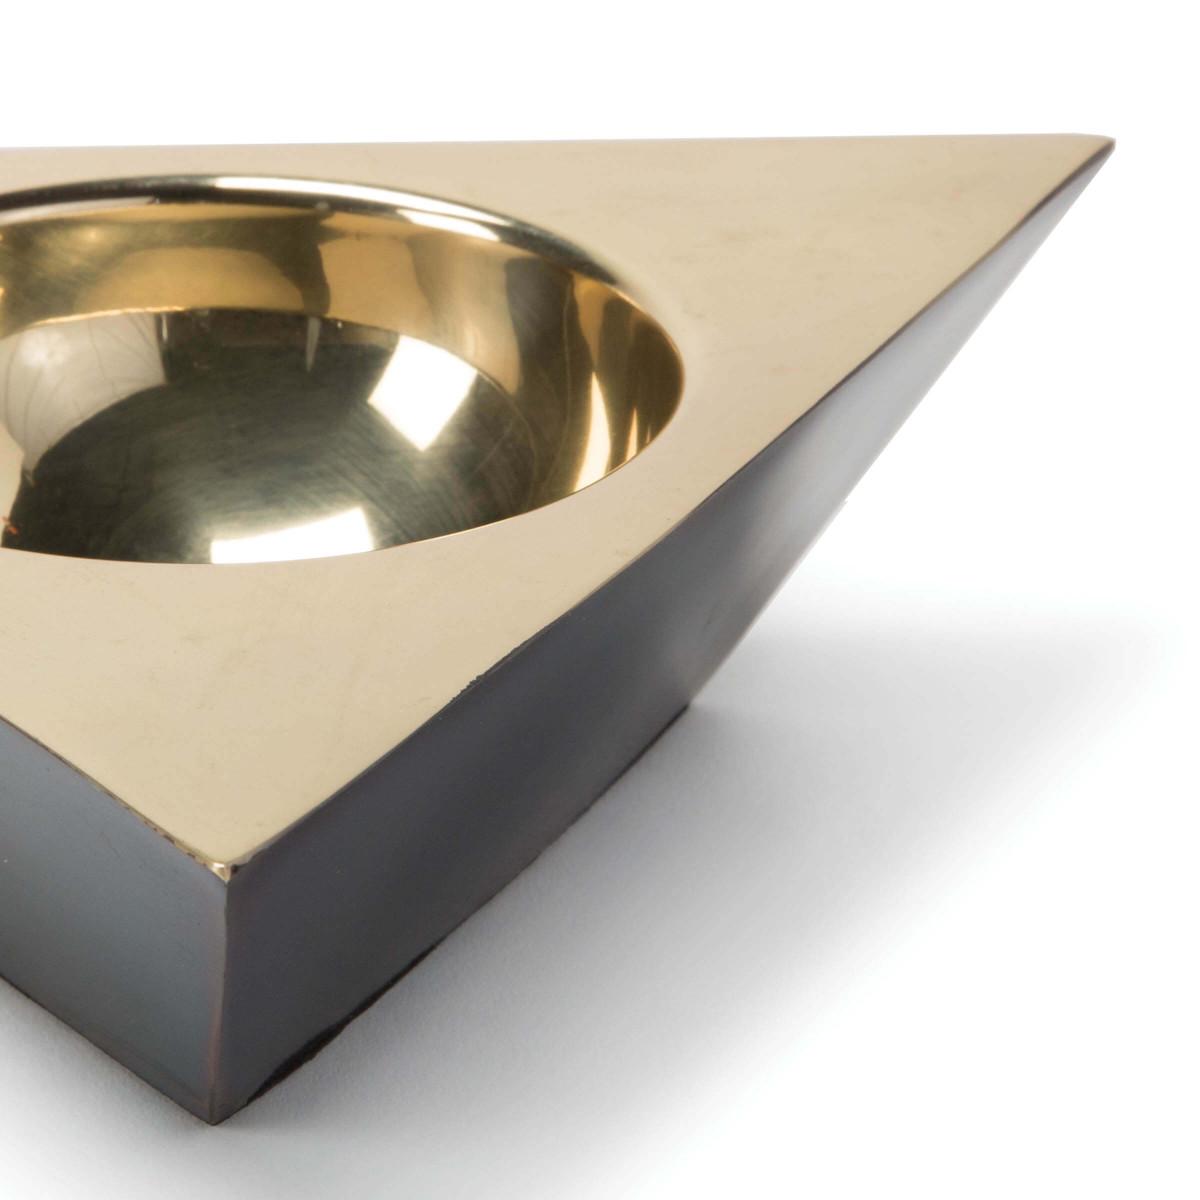 Anko Brass Bowl | Triangular